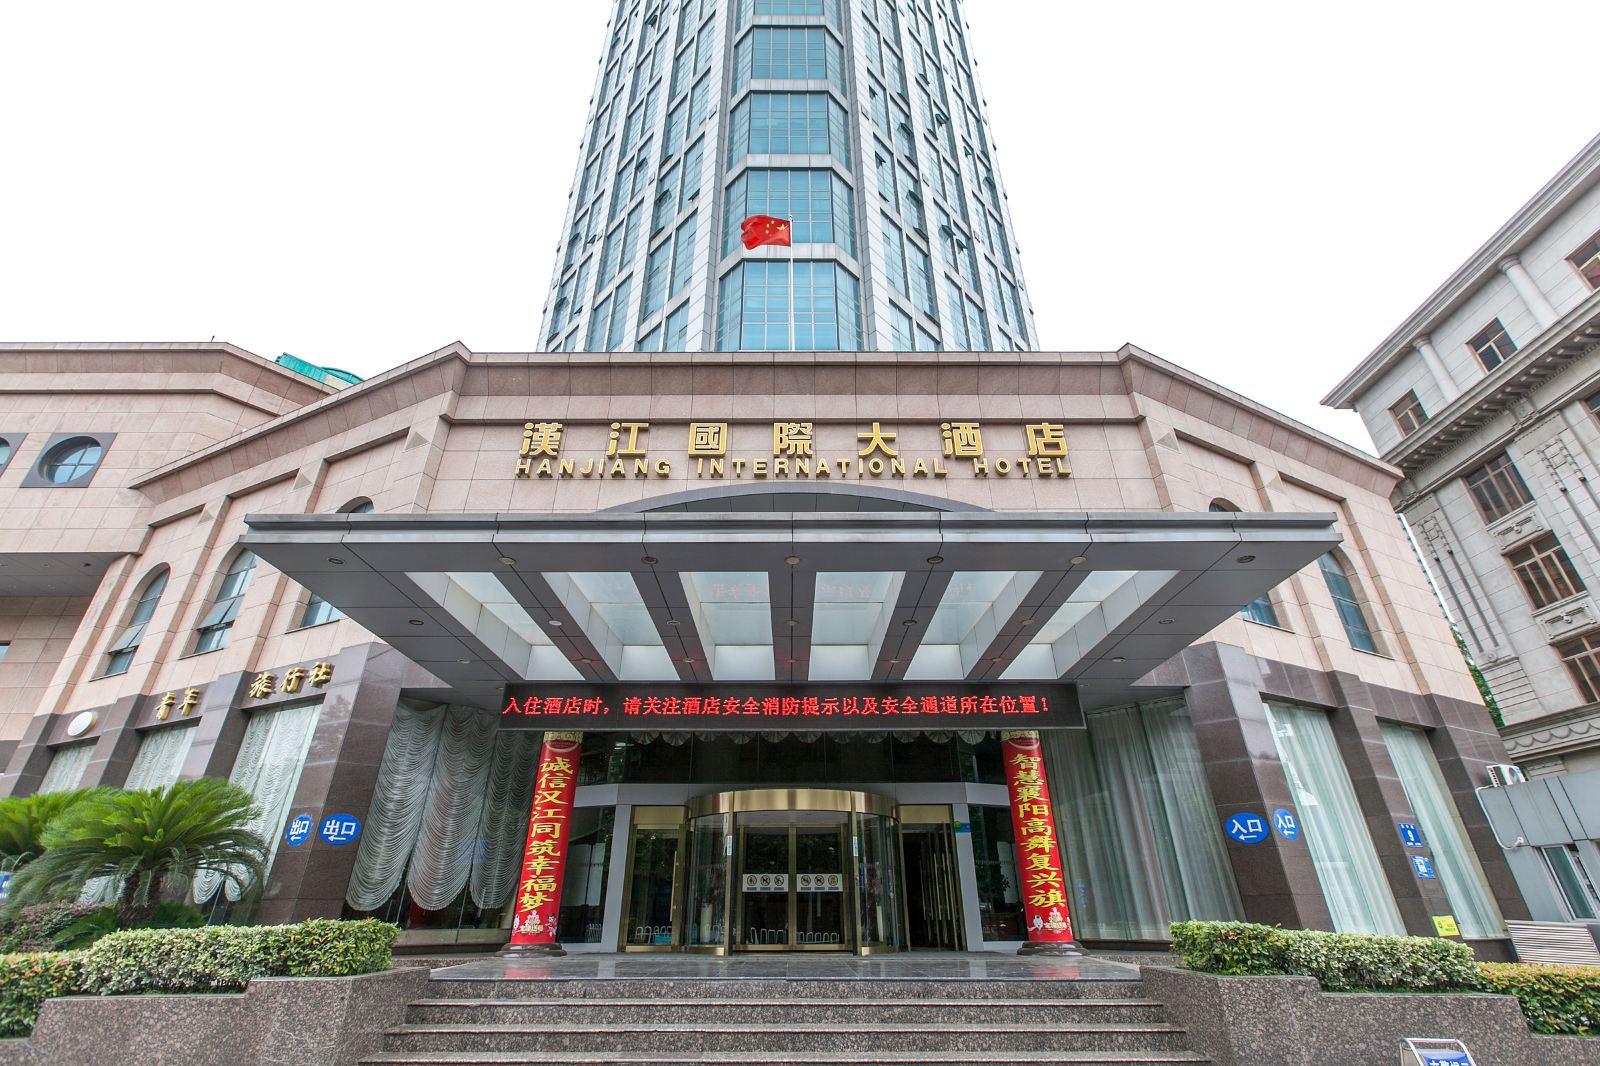 Hanjiang International Hotel